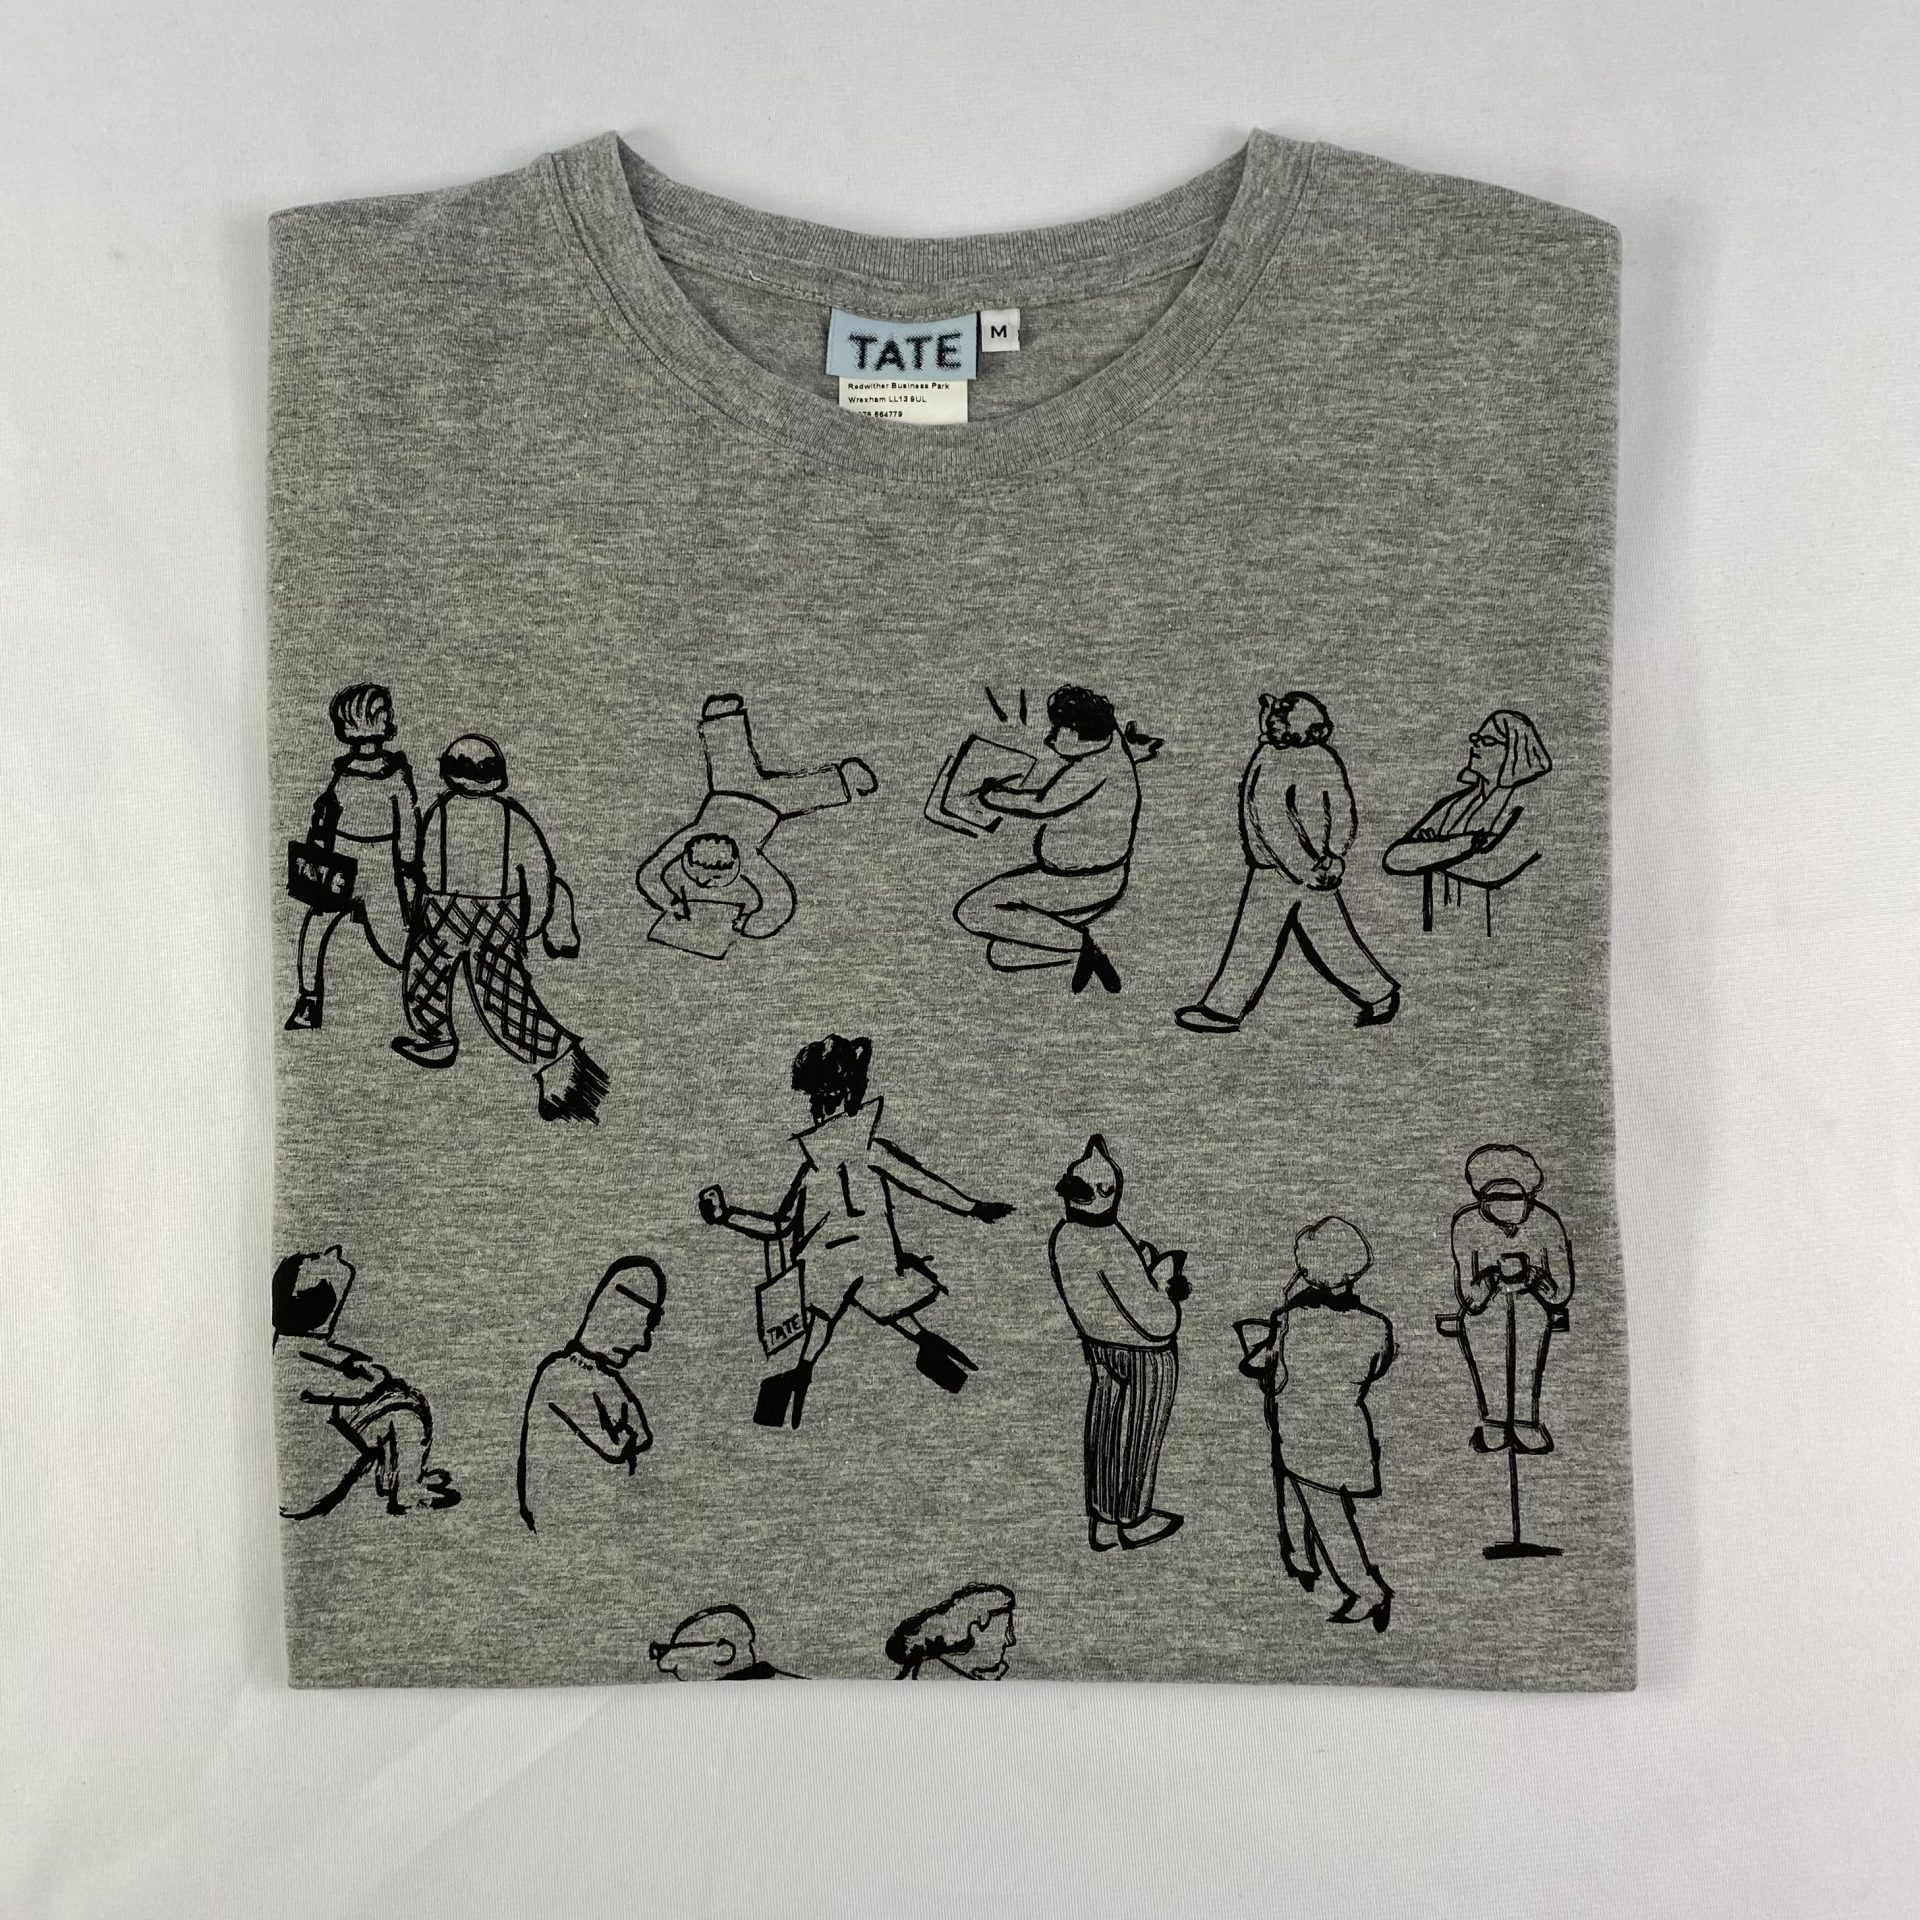 Tate t-shirt print on demand